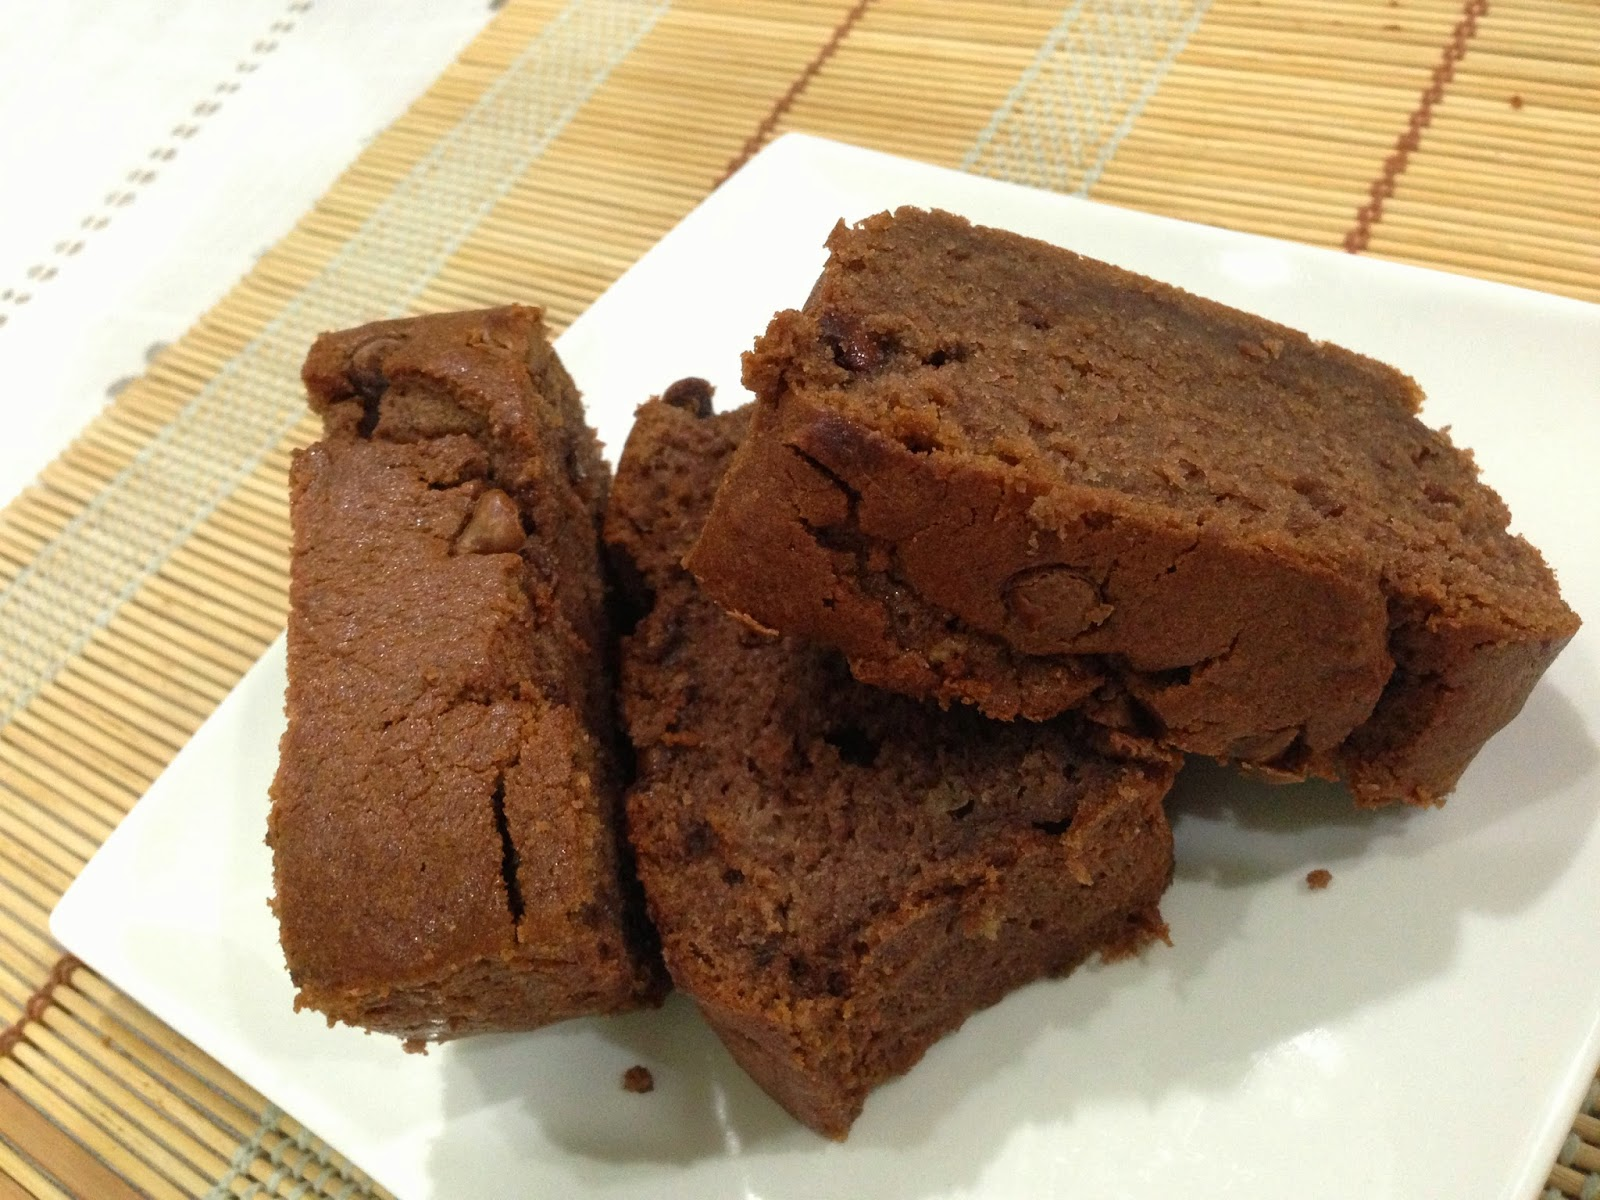 Baking Diary: Deep Chocolate Pound Cake - Bake Along #42